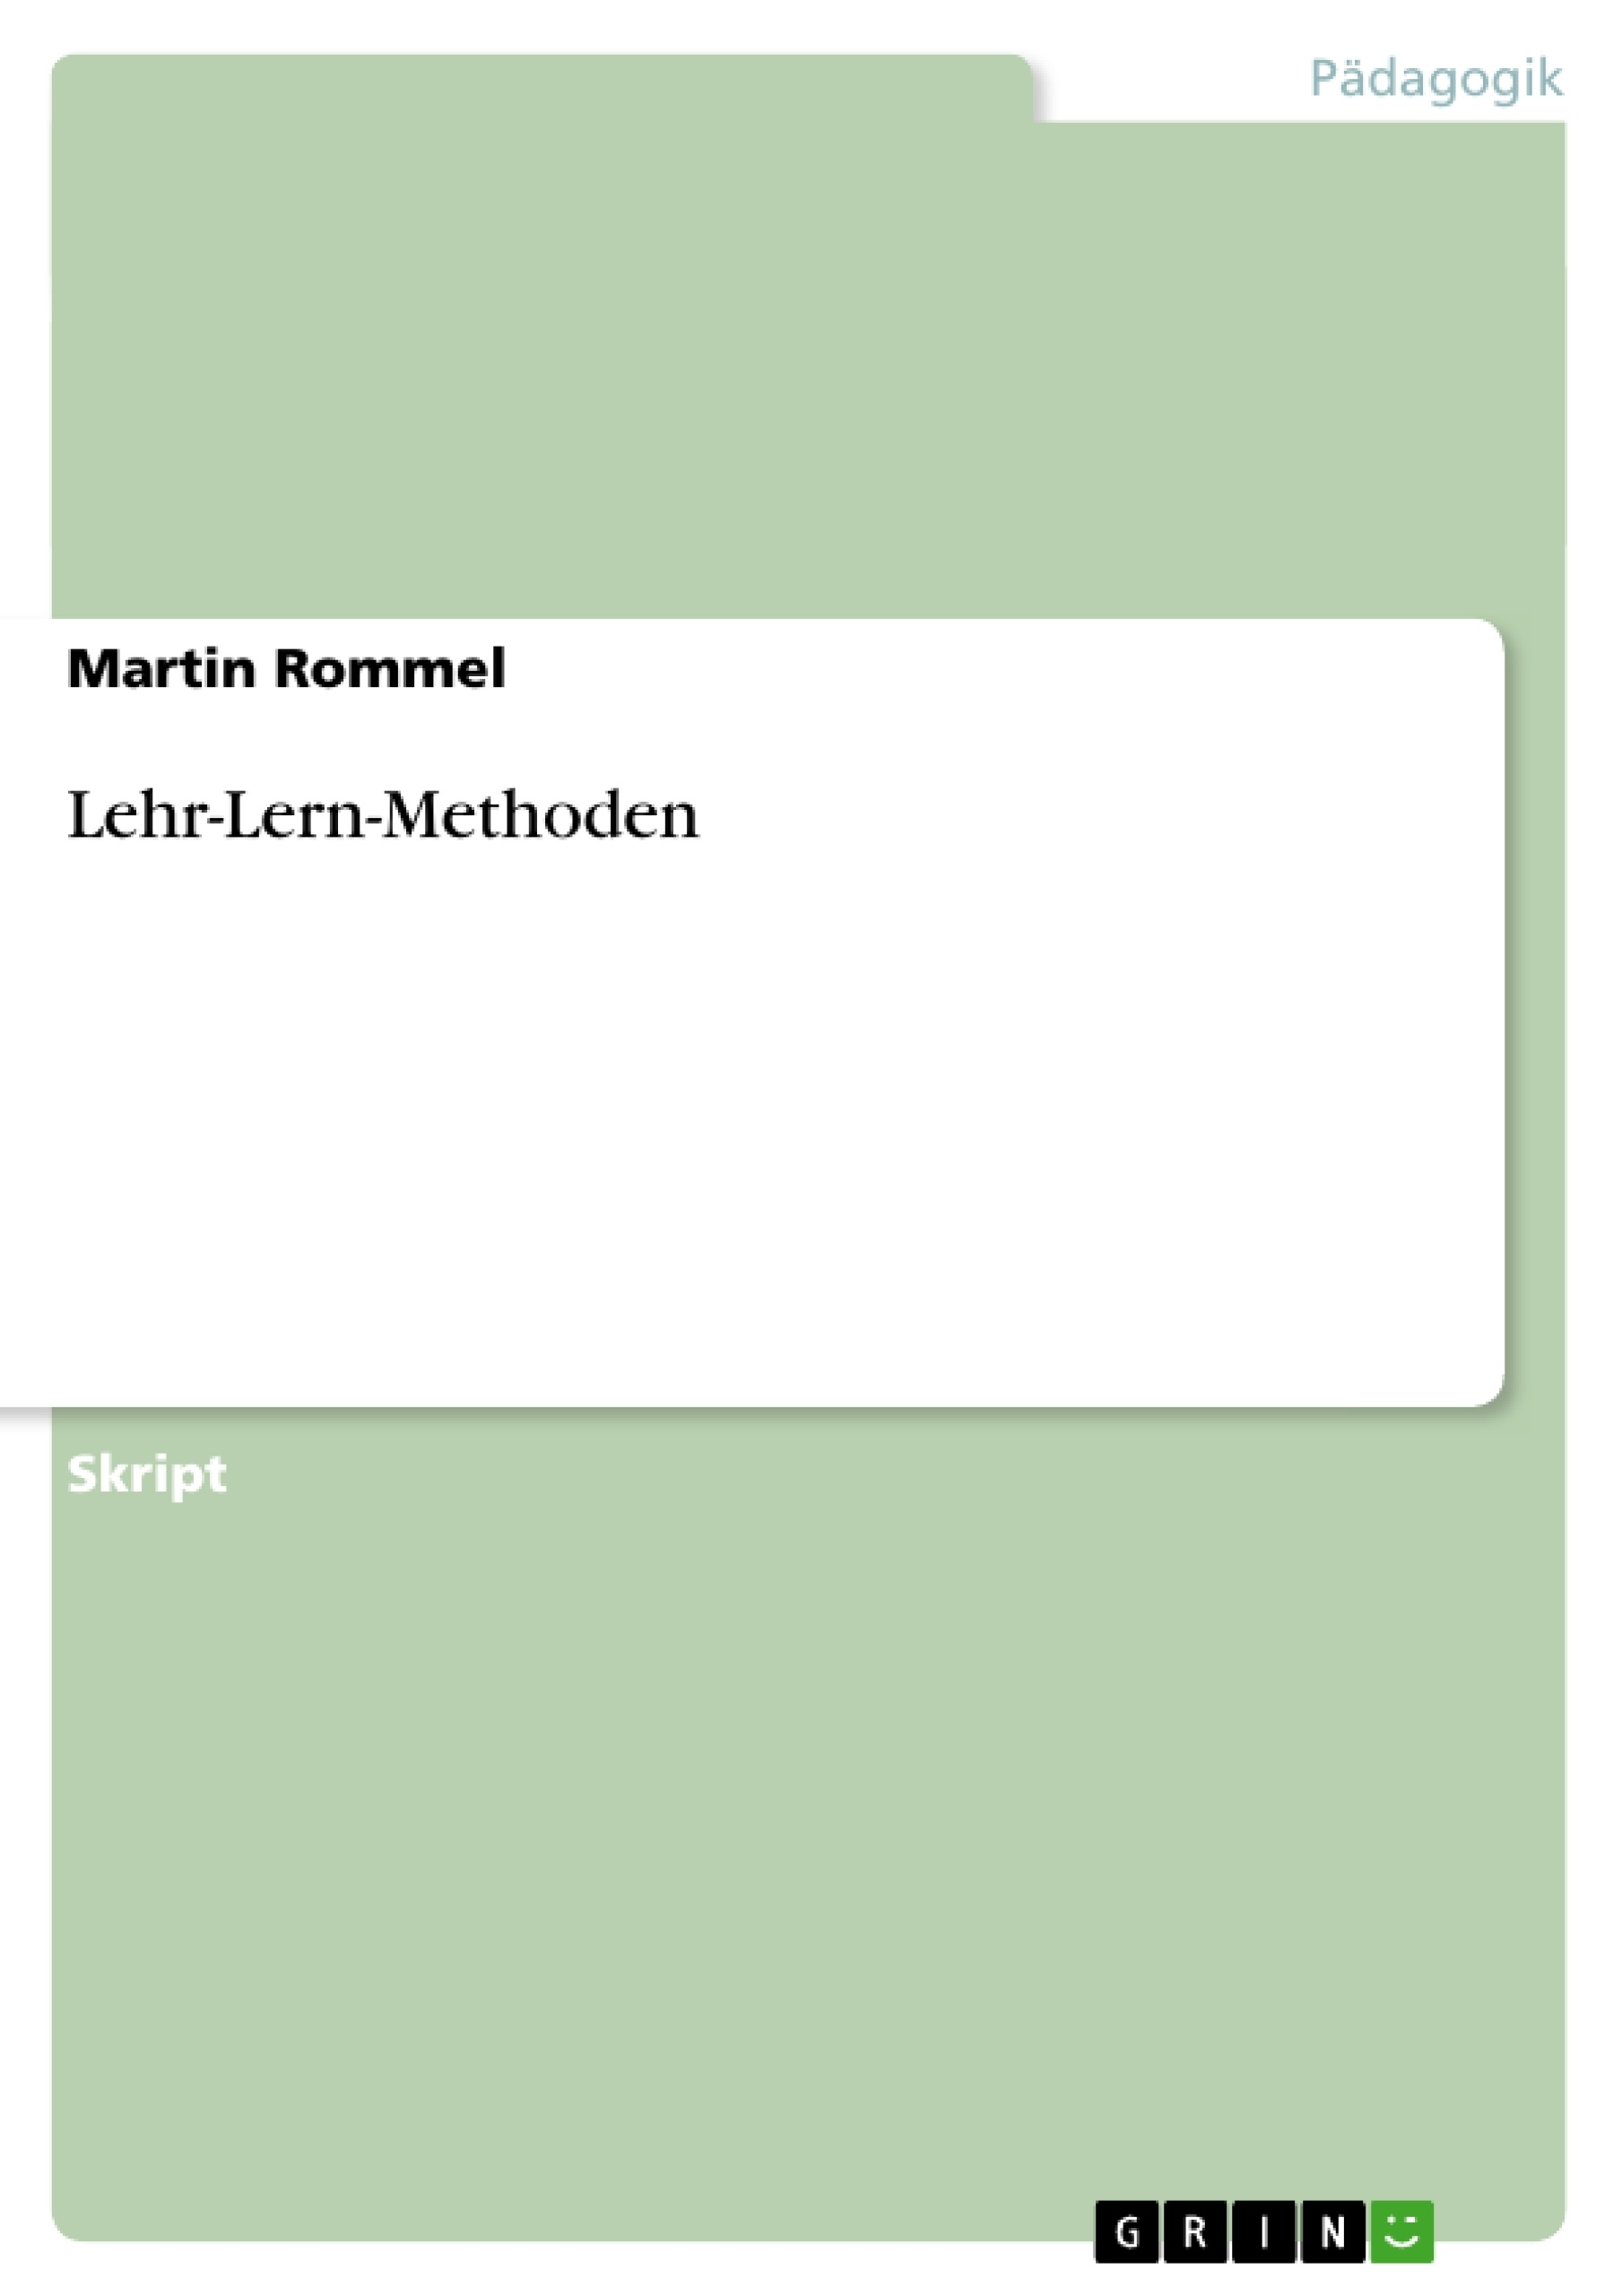 Titel: Lehr-Lern-Methoden